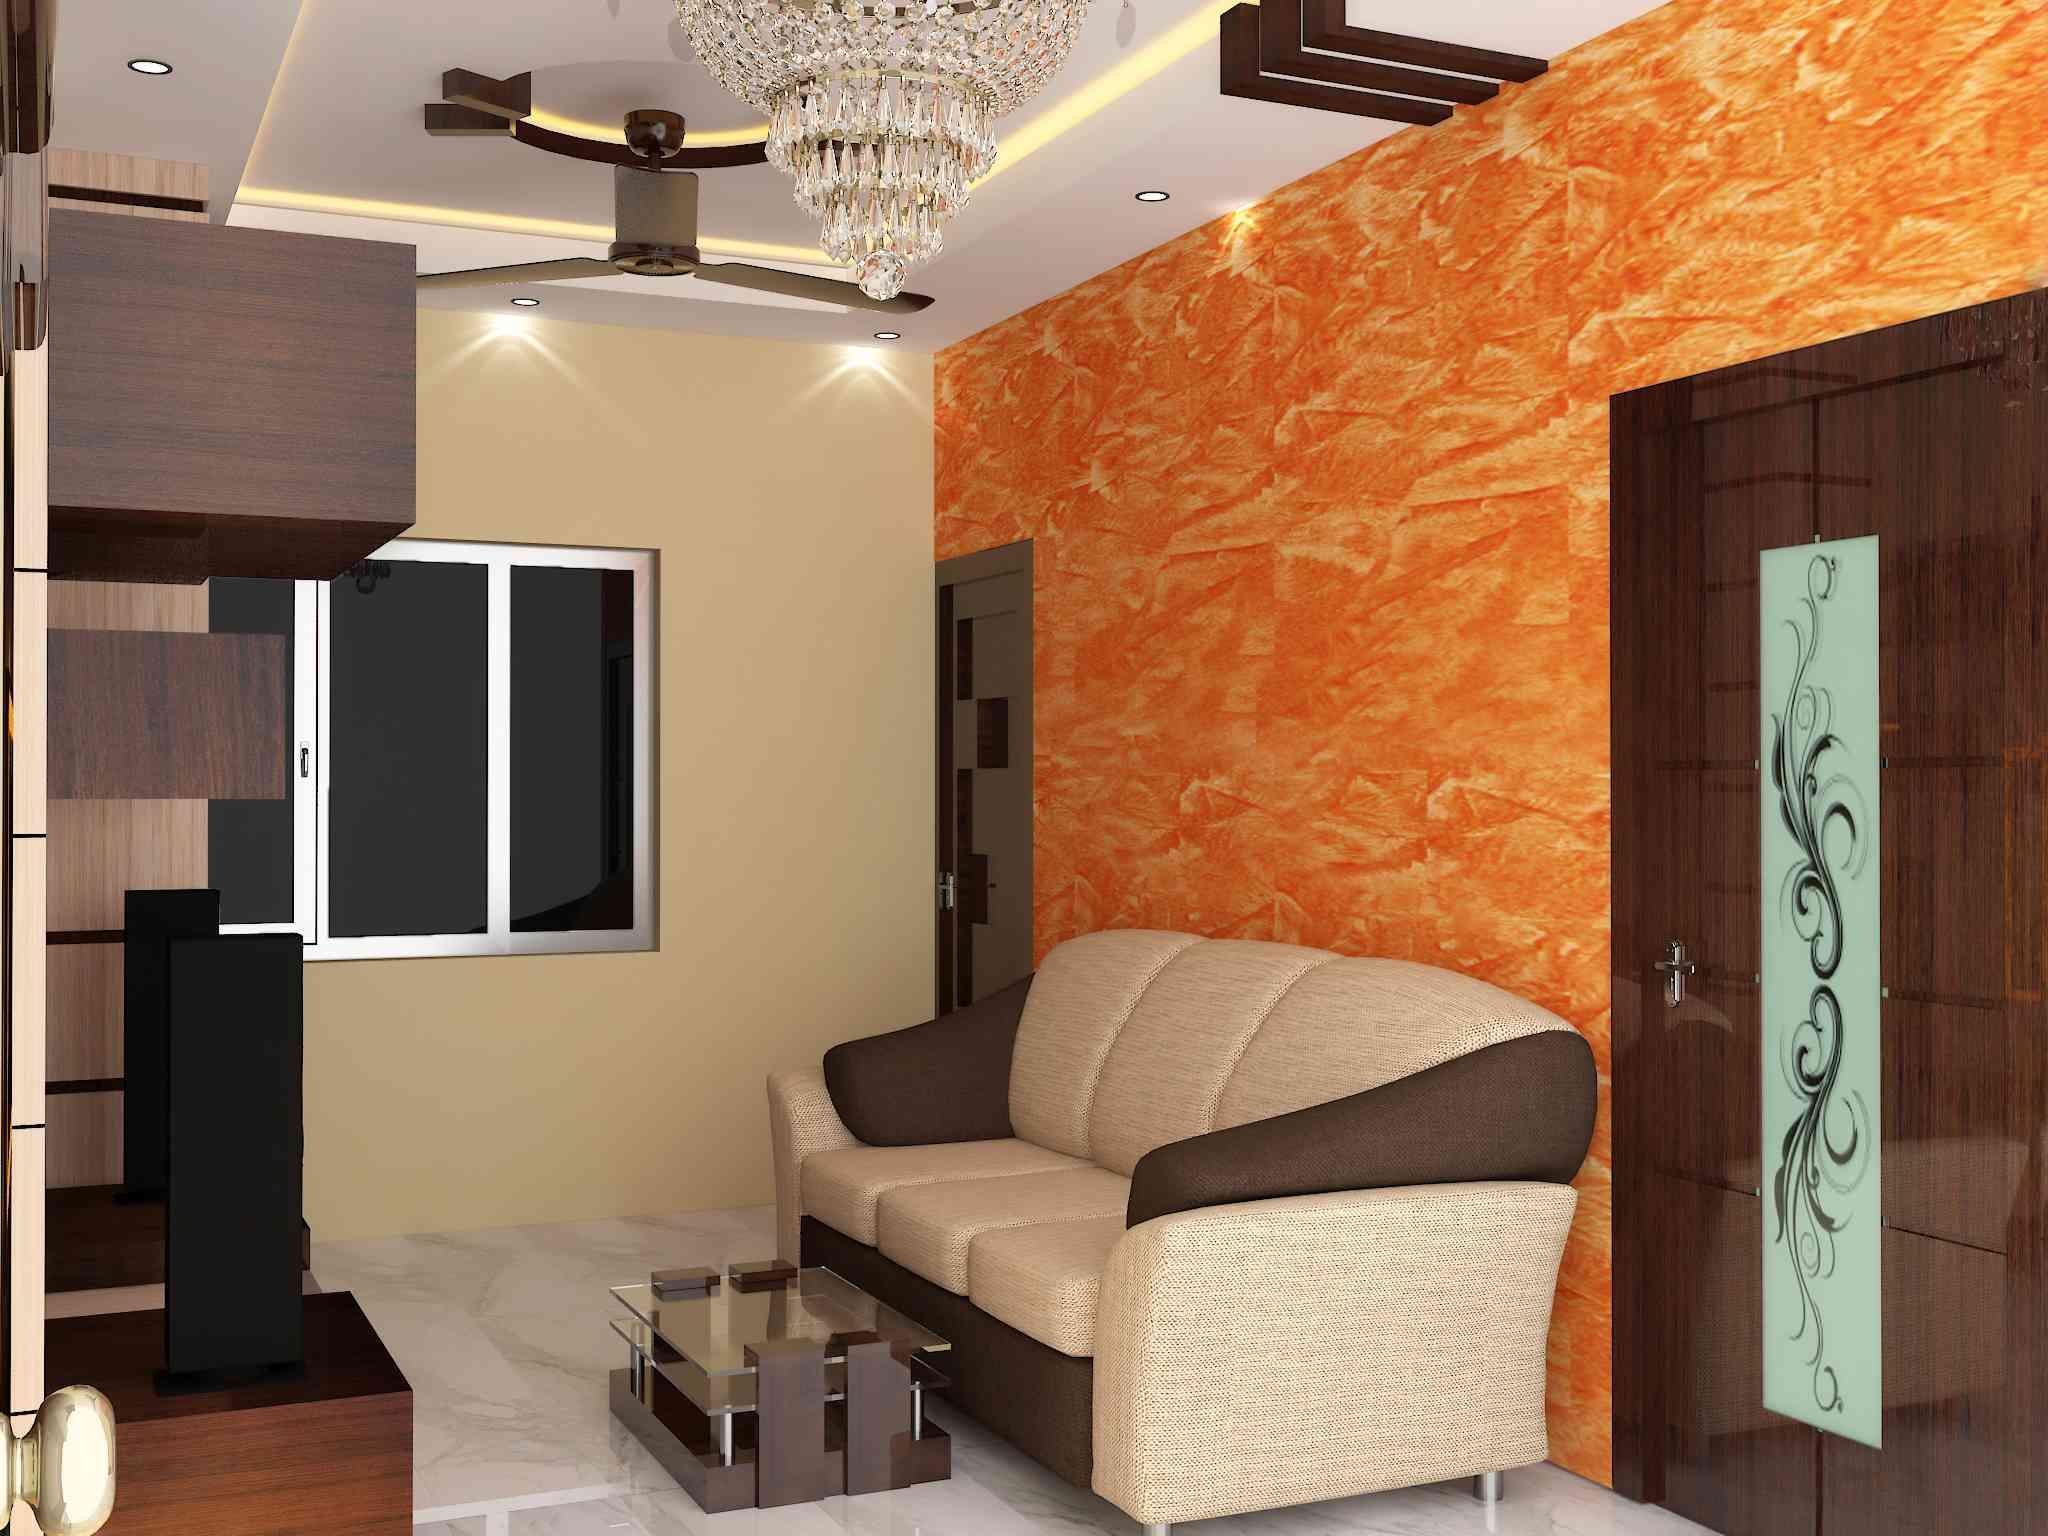 Mandir Designs In Living Room Home Design Ideas Small Living Room Interior Design Inspiration